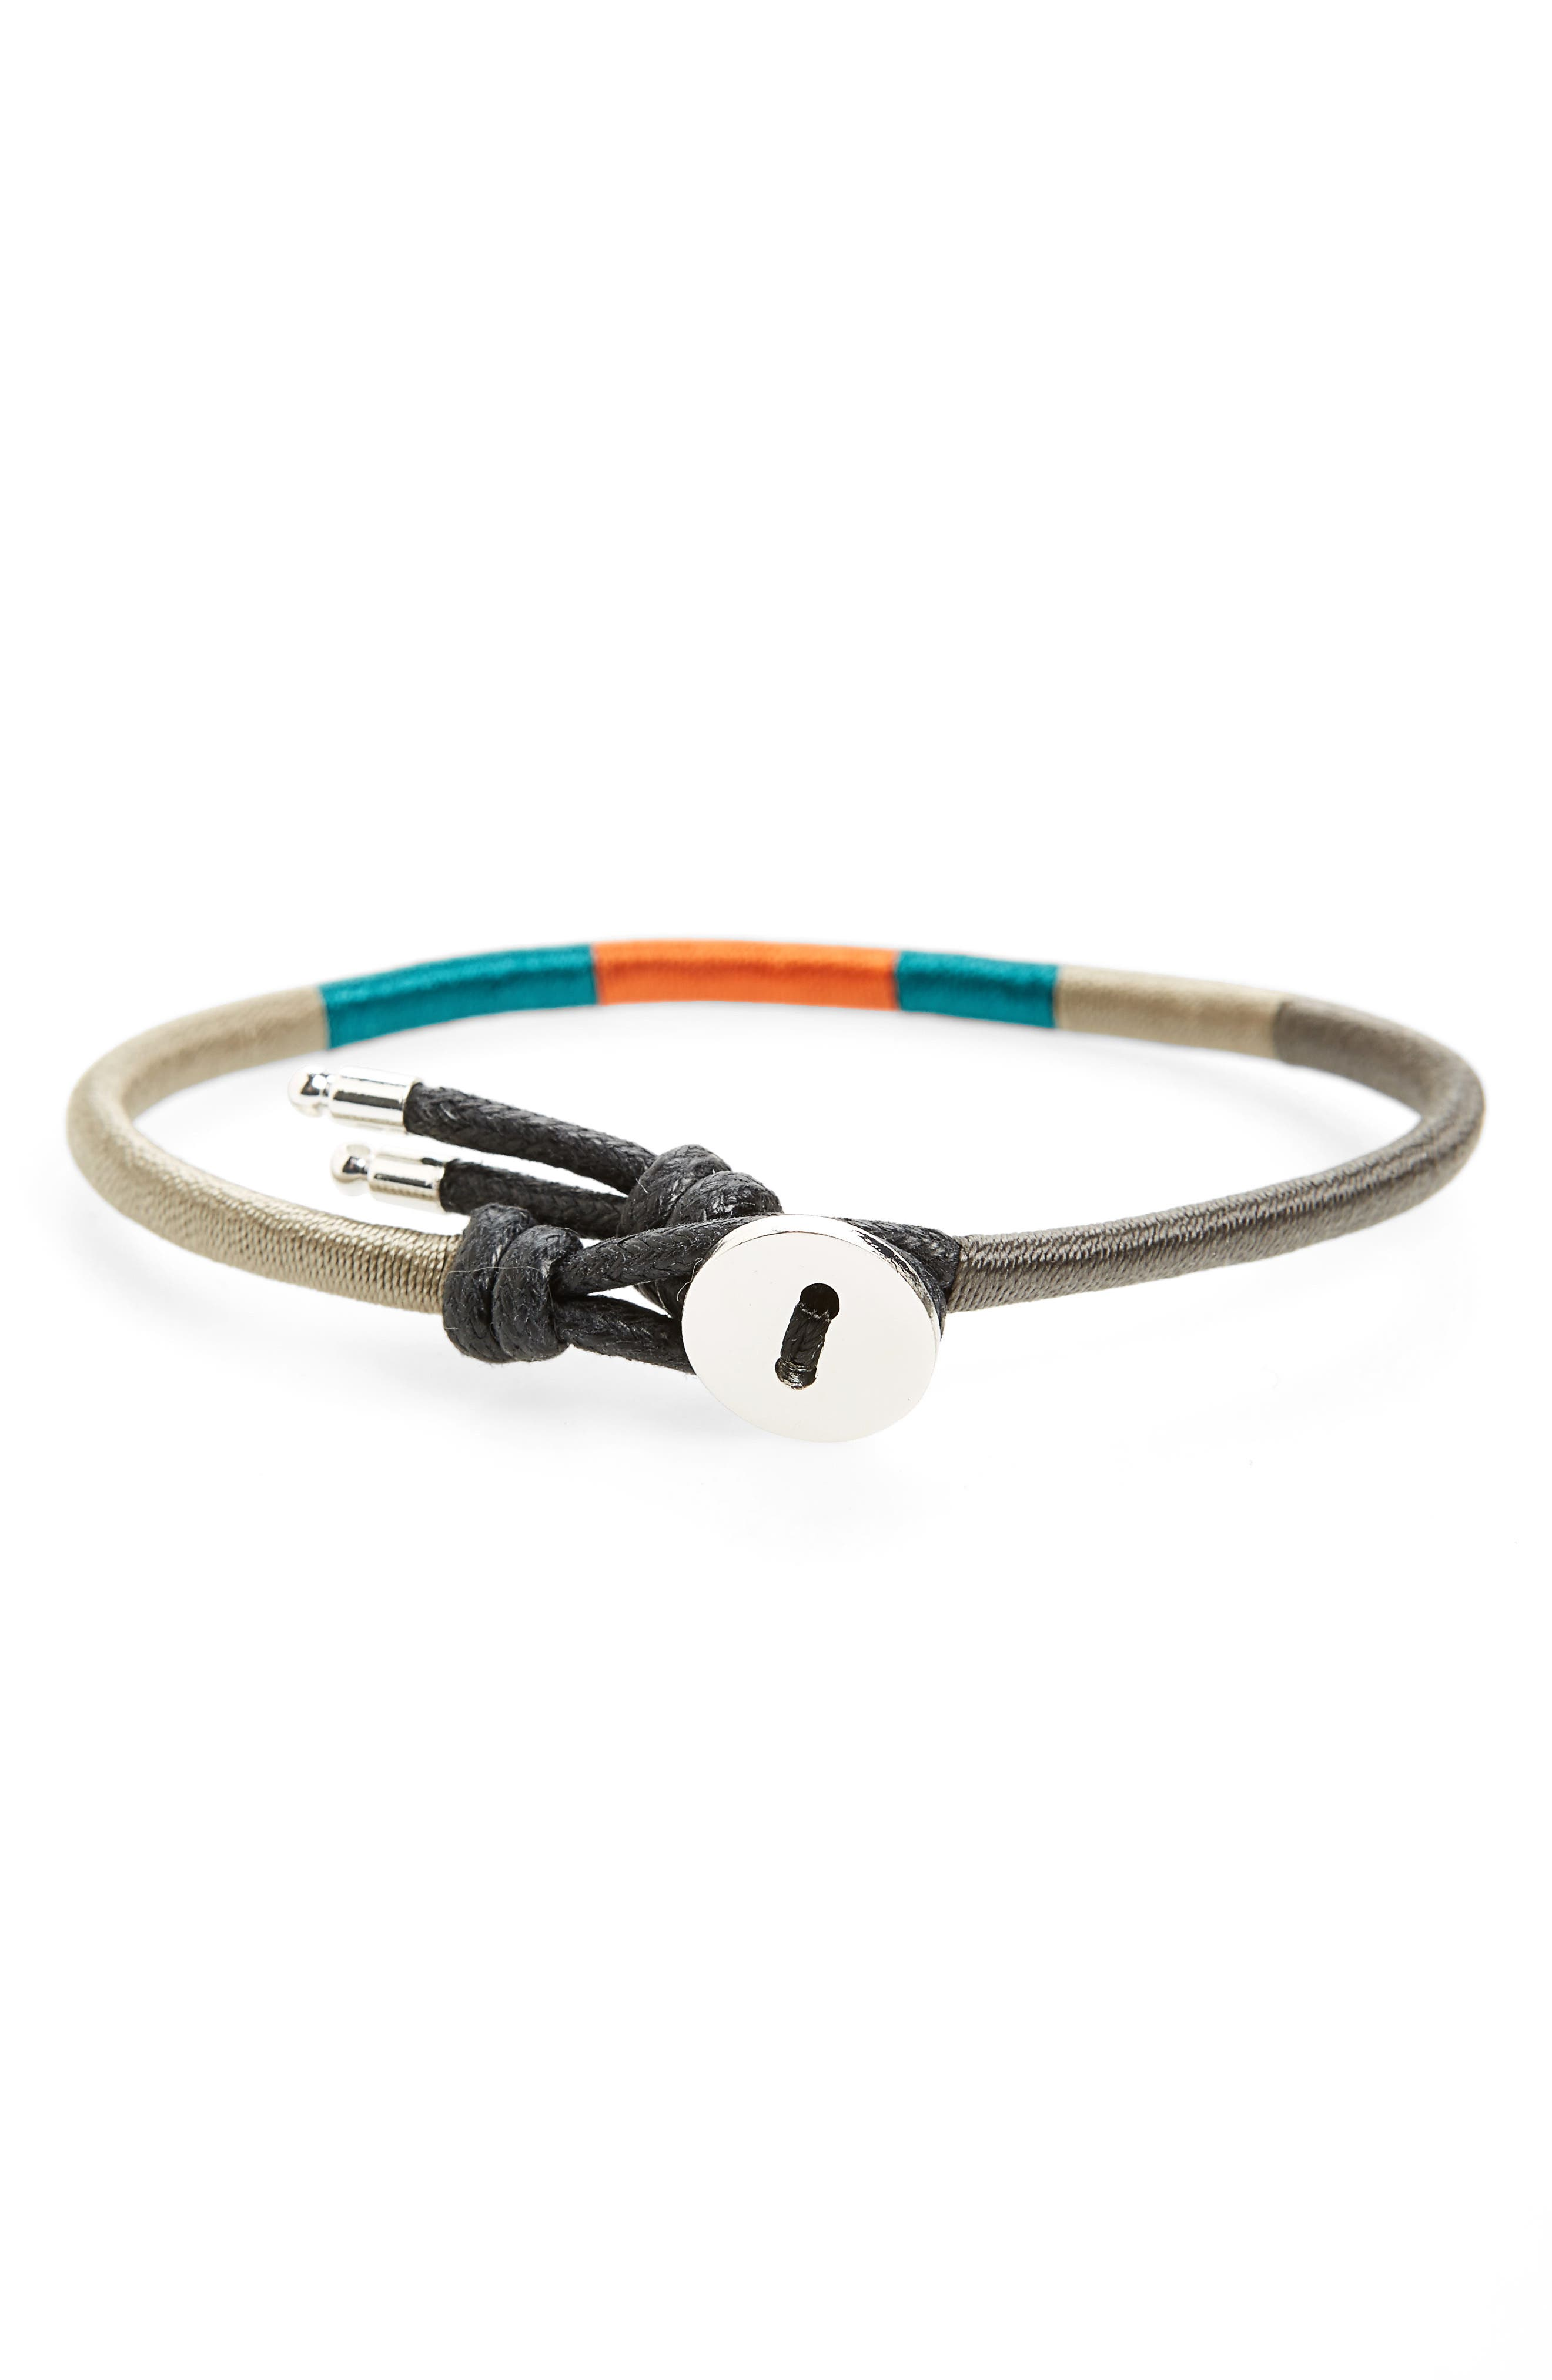 Finn & Taylor Woven Bracelet,                         Main,                         color, Black/ Grey/ Green/ Orange